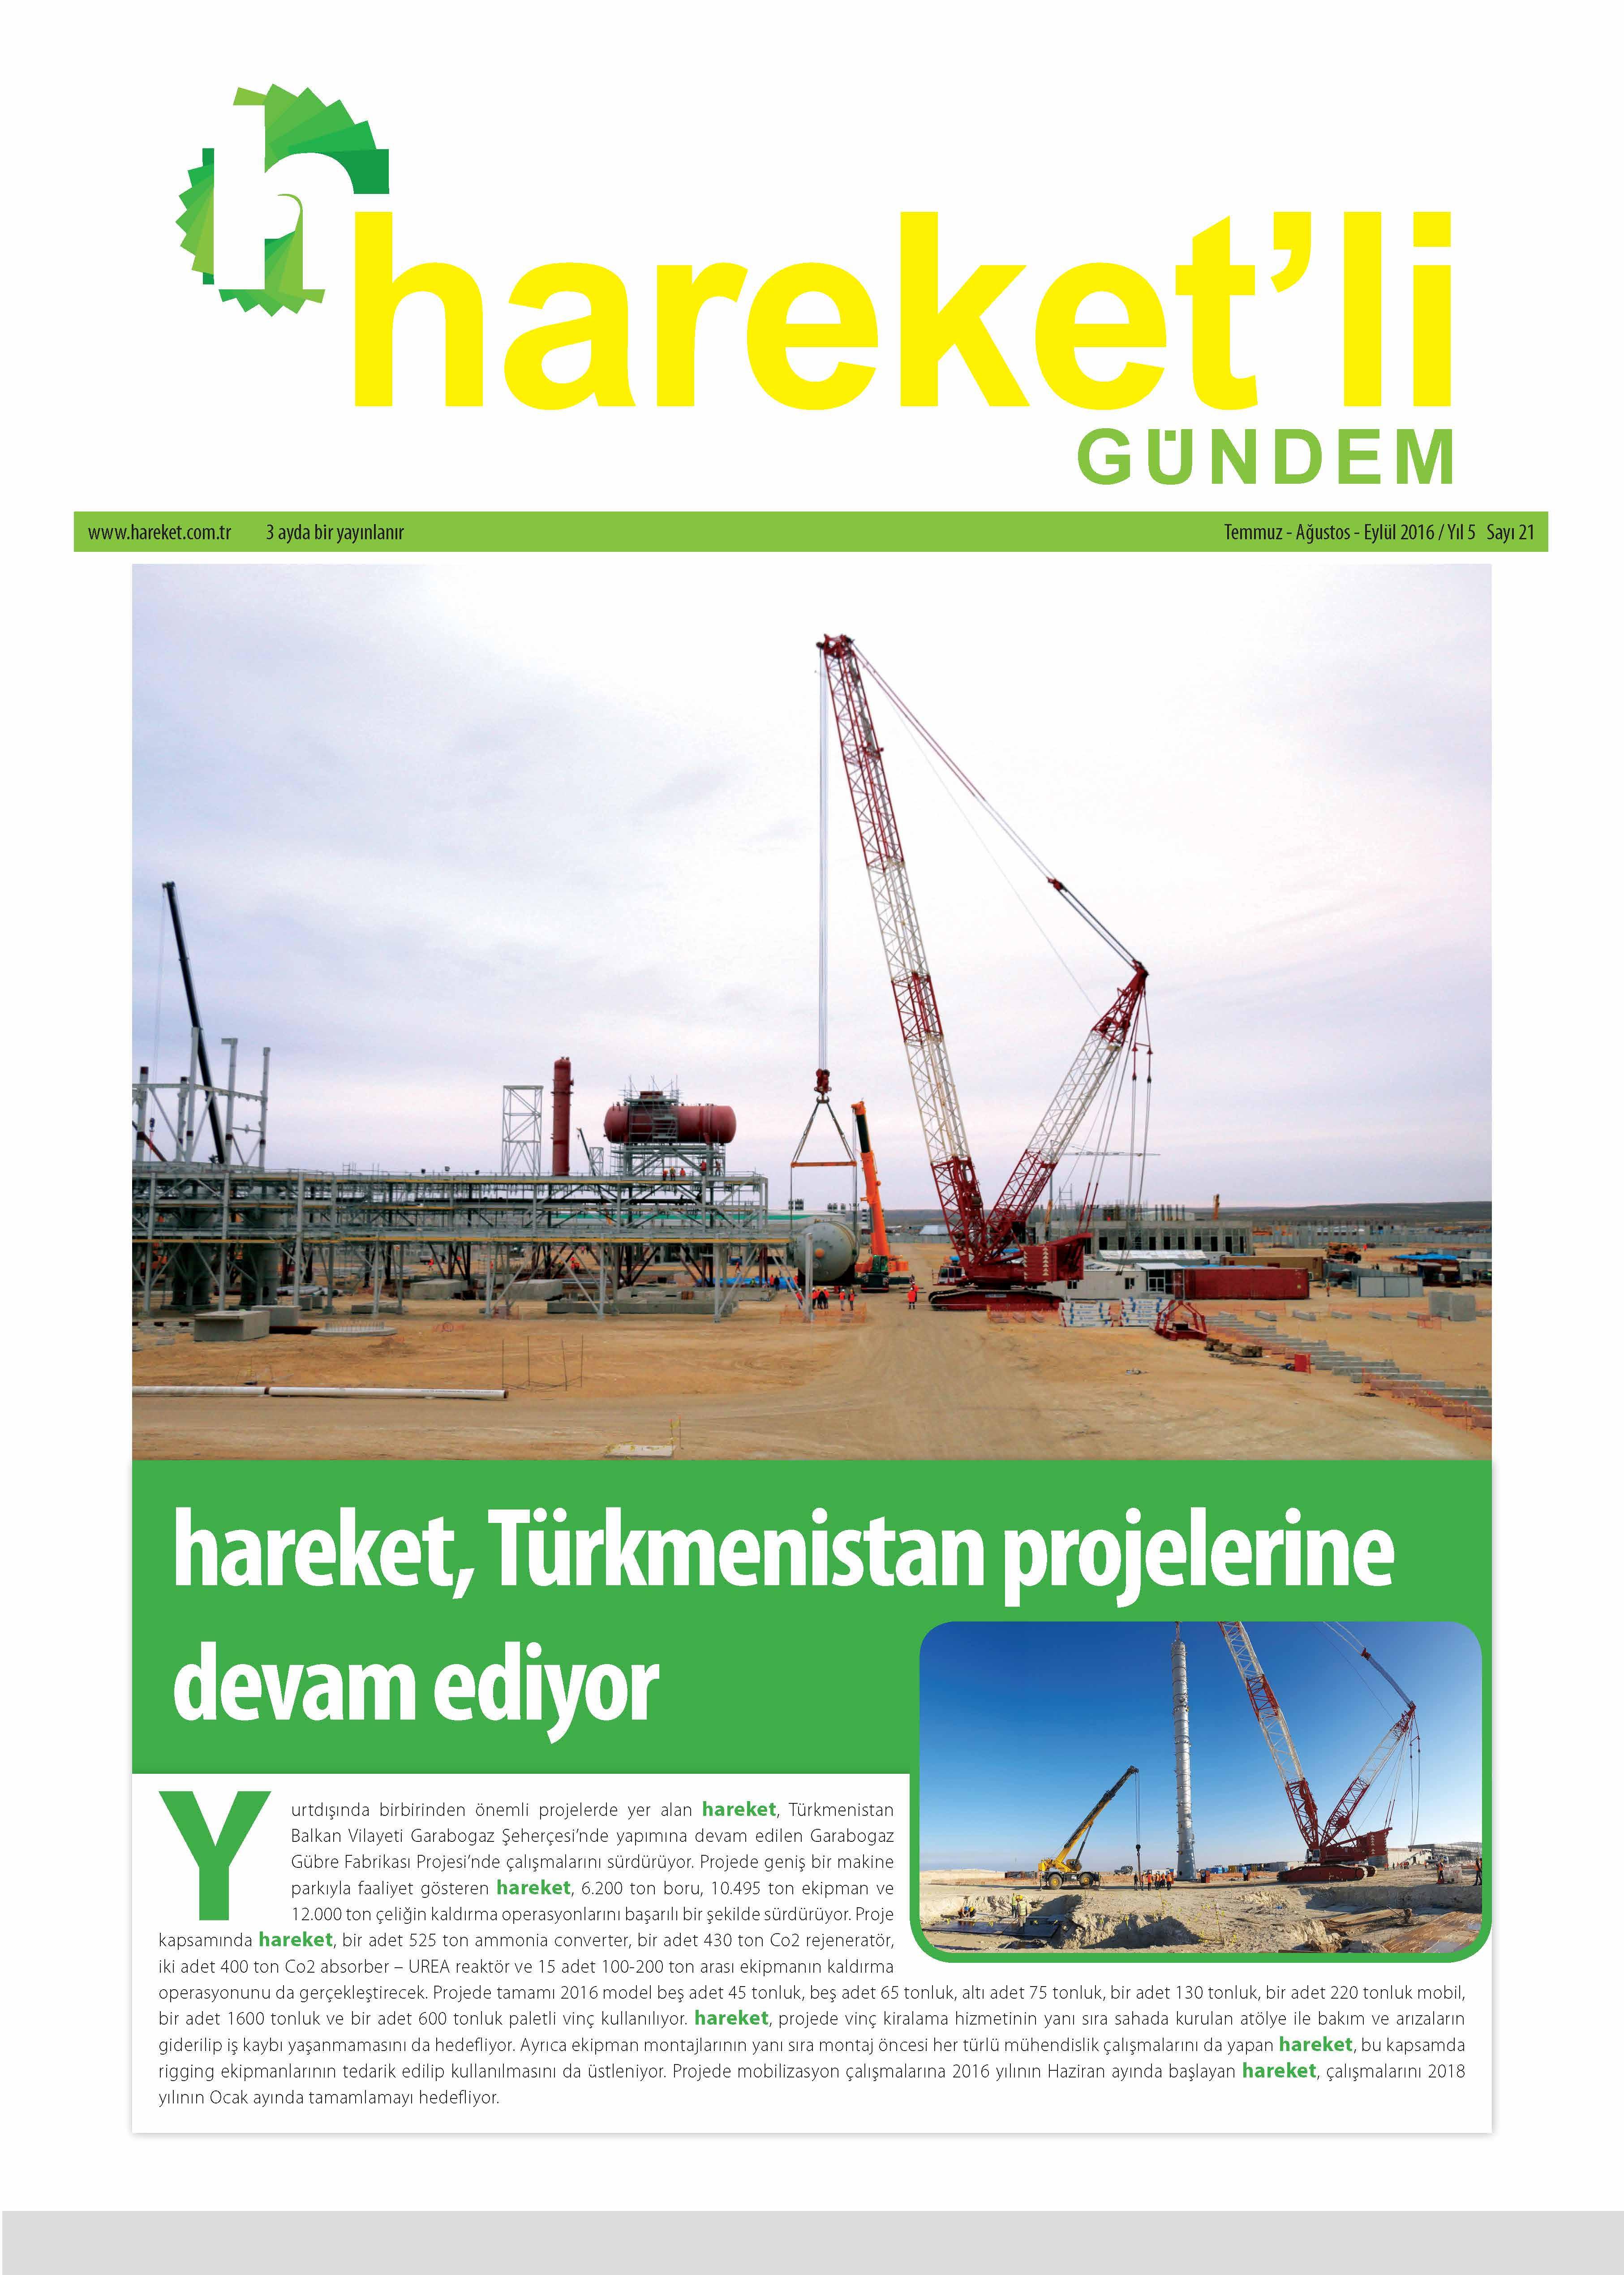 Hareket'li Gündem Magazine - ISSEU 21